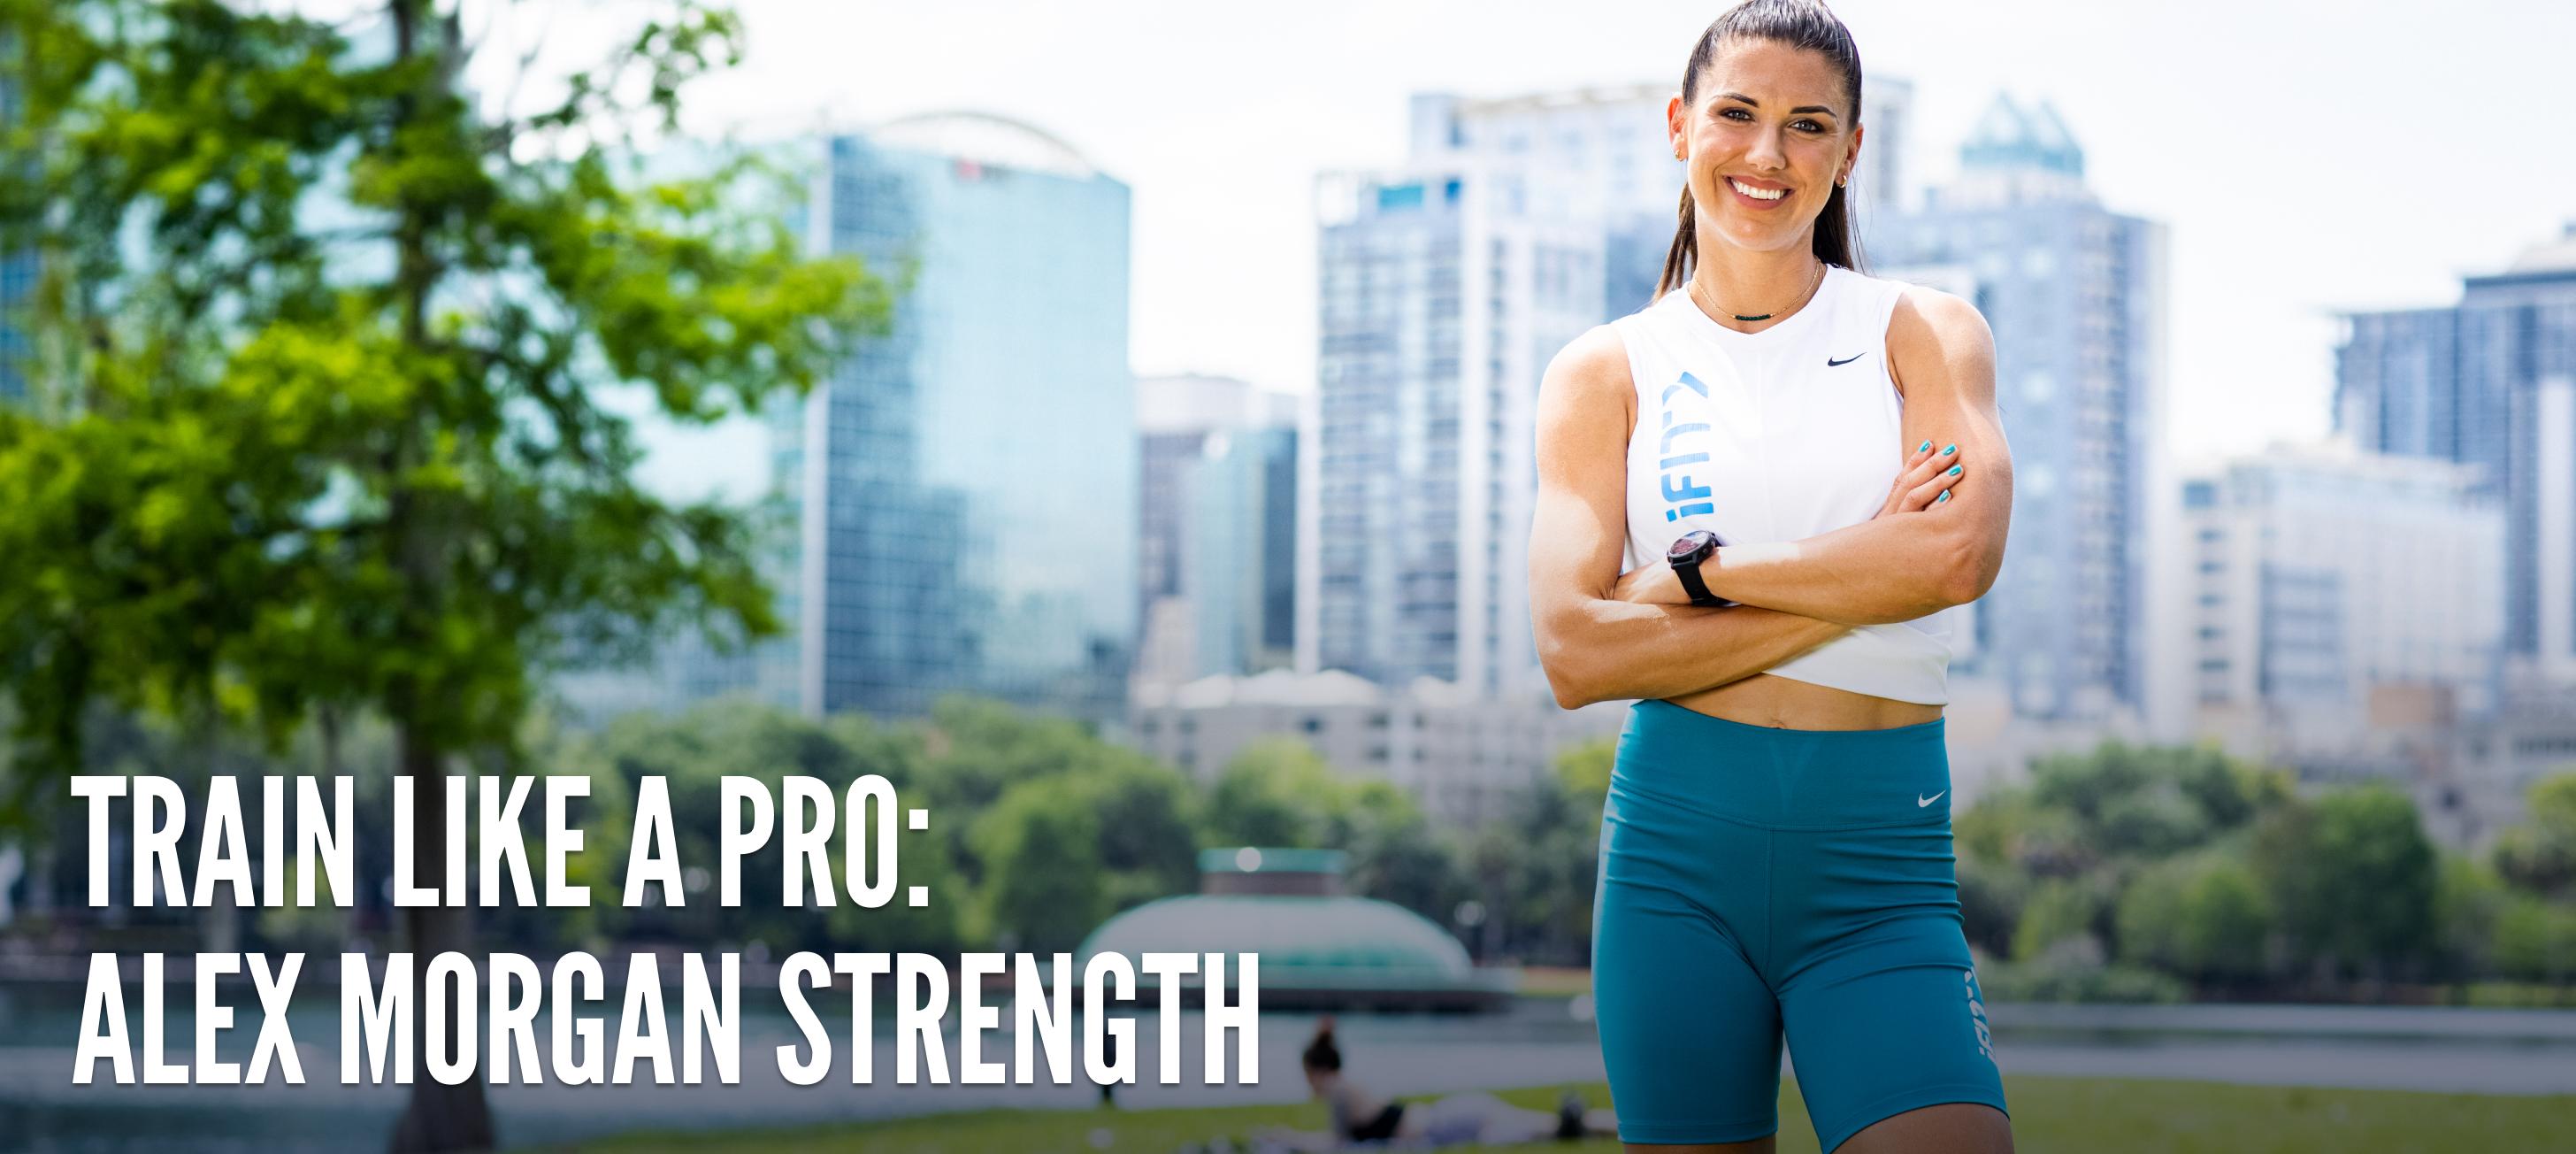 iFit Train Like a Pro: Alex Morgan strength workouts